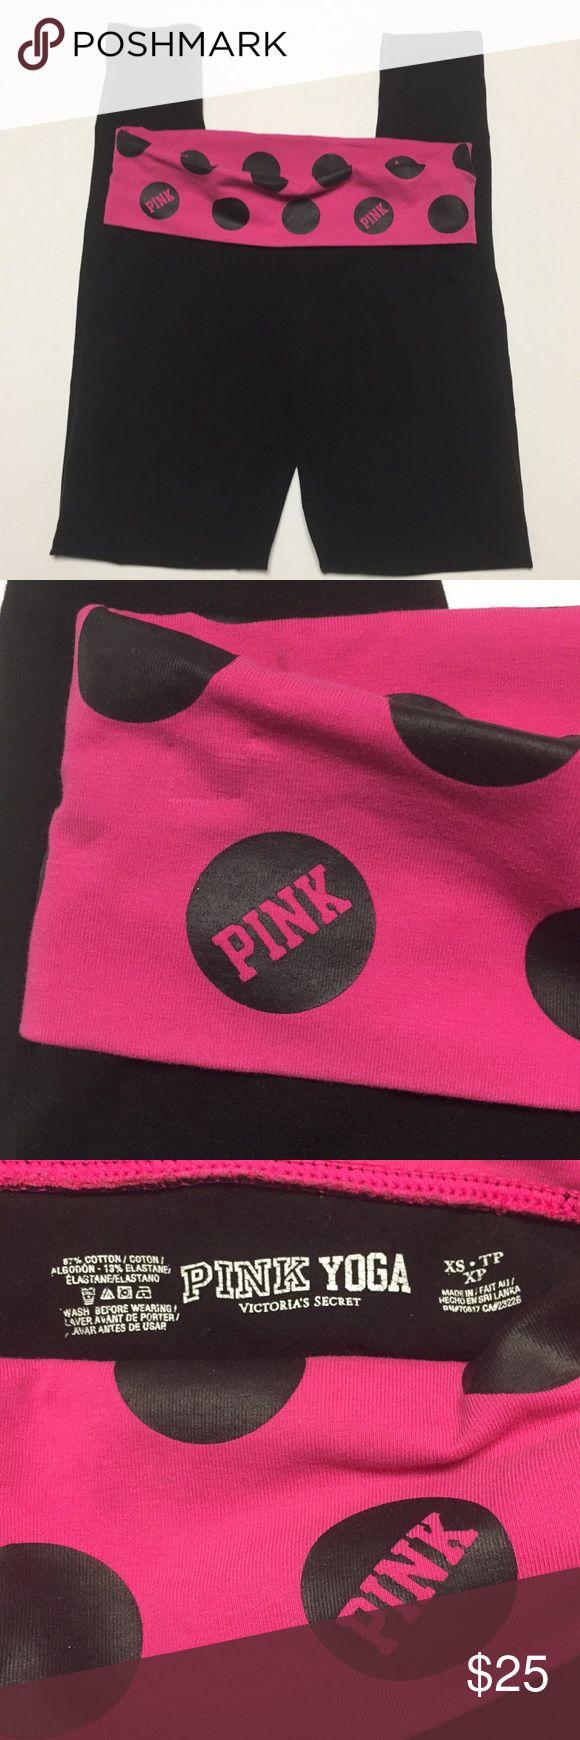 "Victoria's Secret PINK yoga pants Victoria's Secret PINK yoga pants Black and pink. Black polka dots. Sz XS/TP XP  Measurements  Waist 14"" circumference 28"" Rise 8"" Inseam 29"" Leg opening 4"" Stretch  Item loc 03 red 05022018 PINK by Victoria's Secret Pants Track Pants & Joggers"